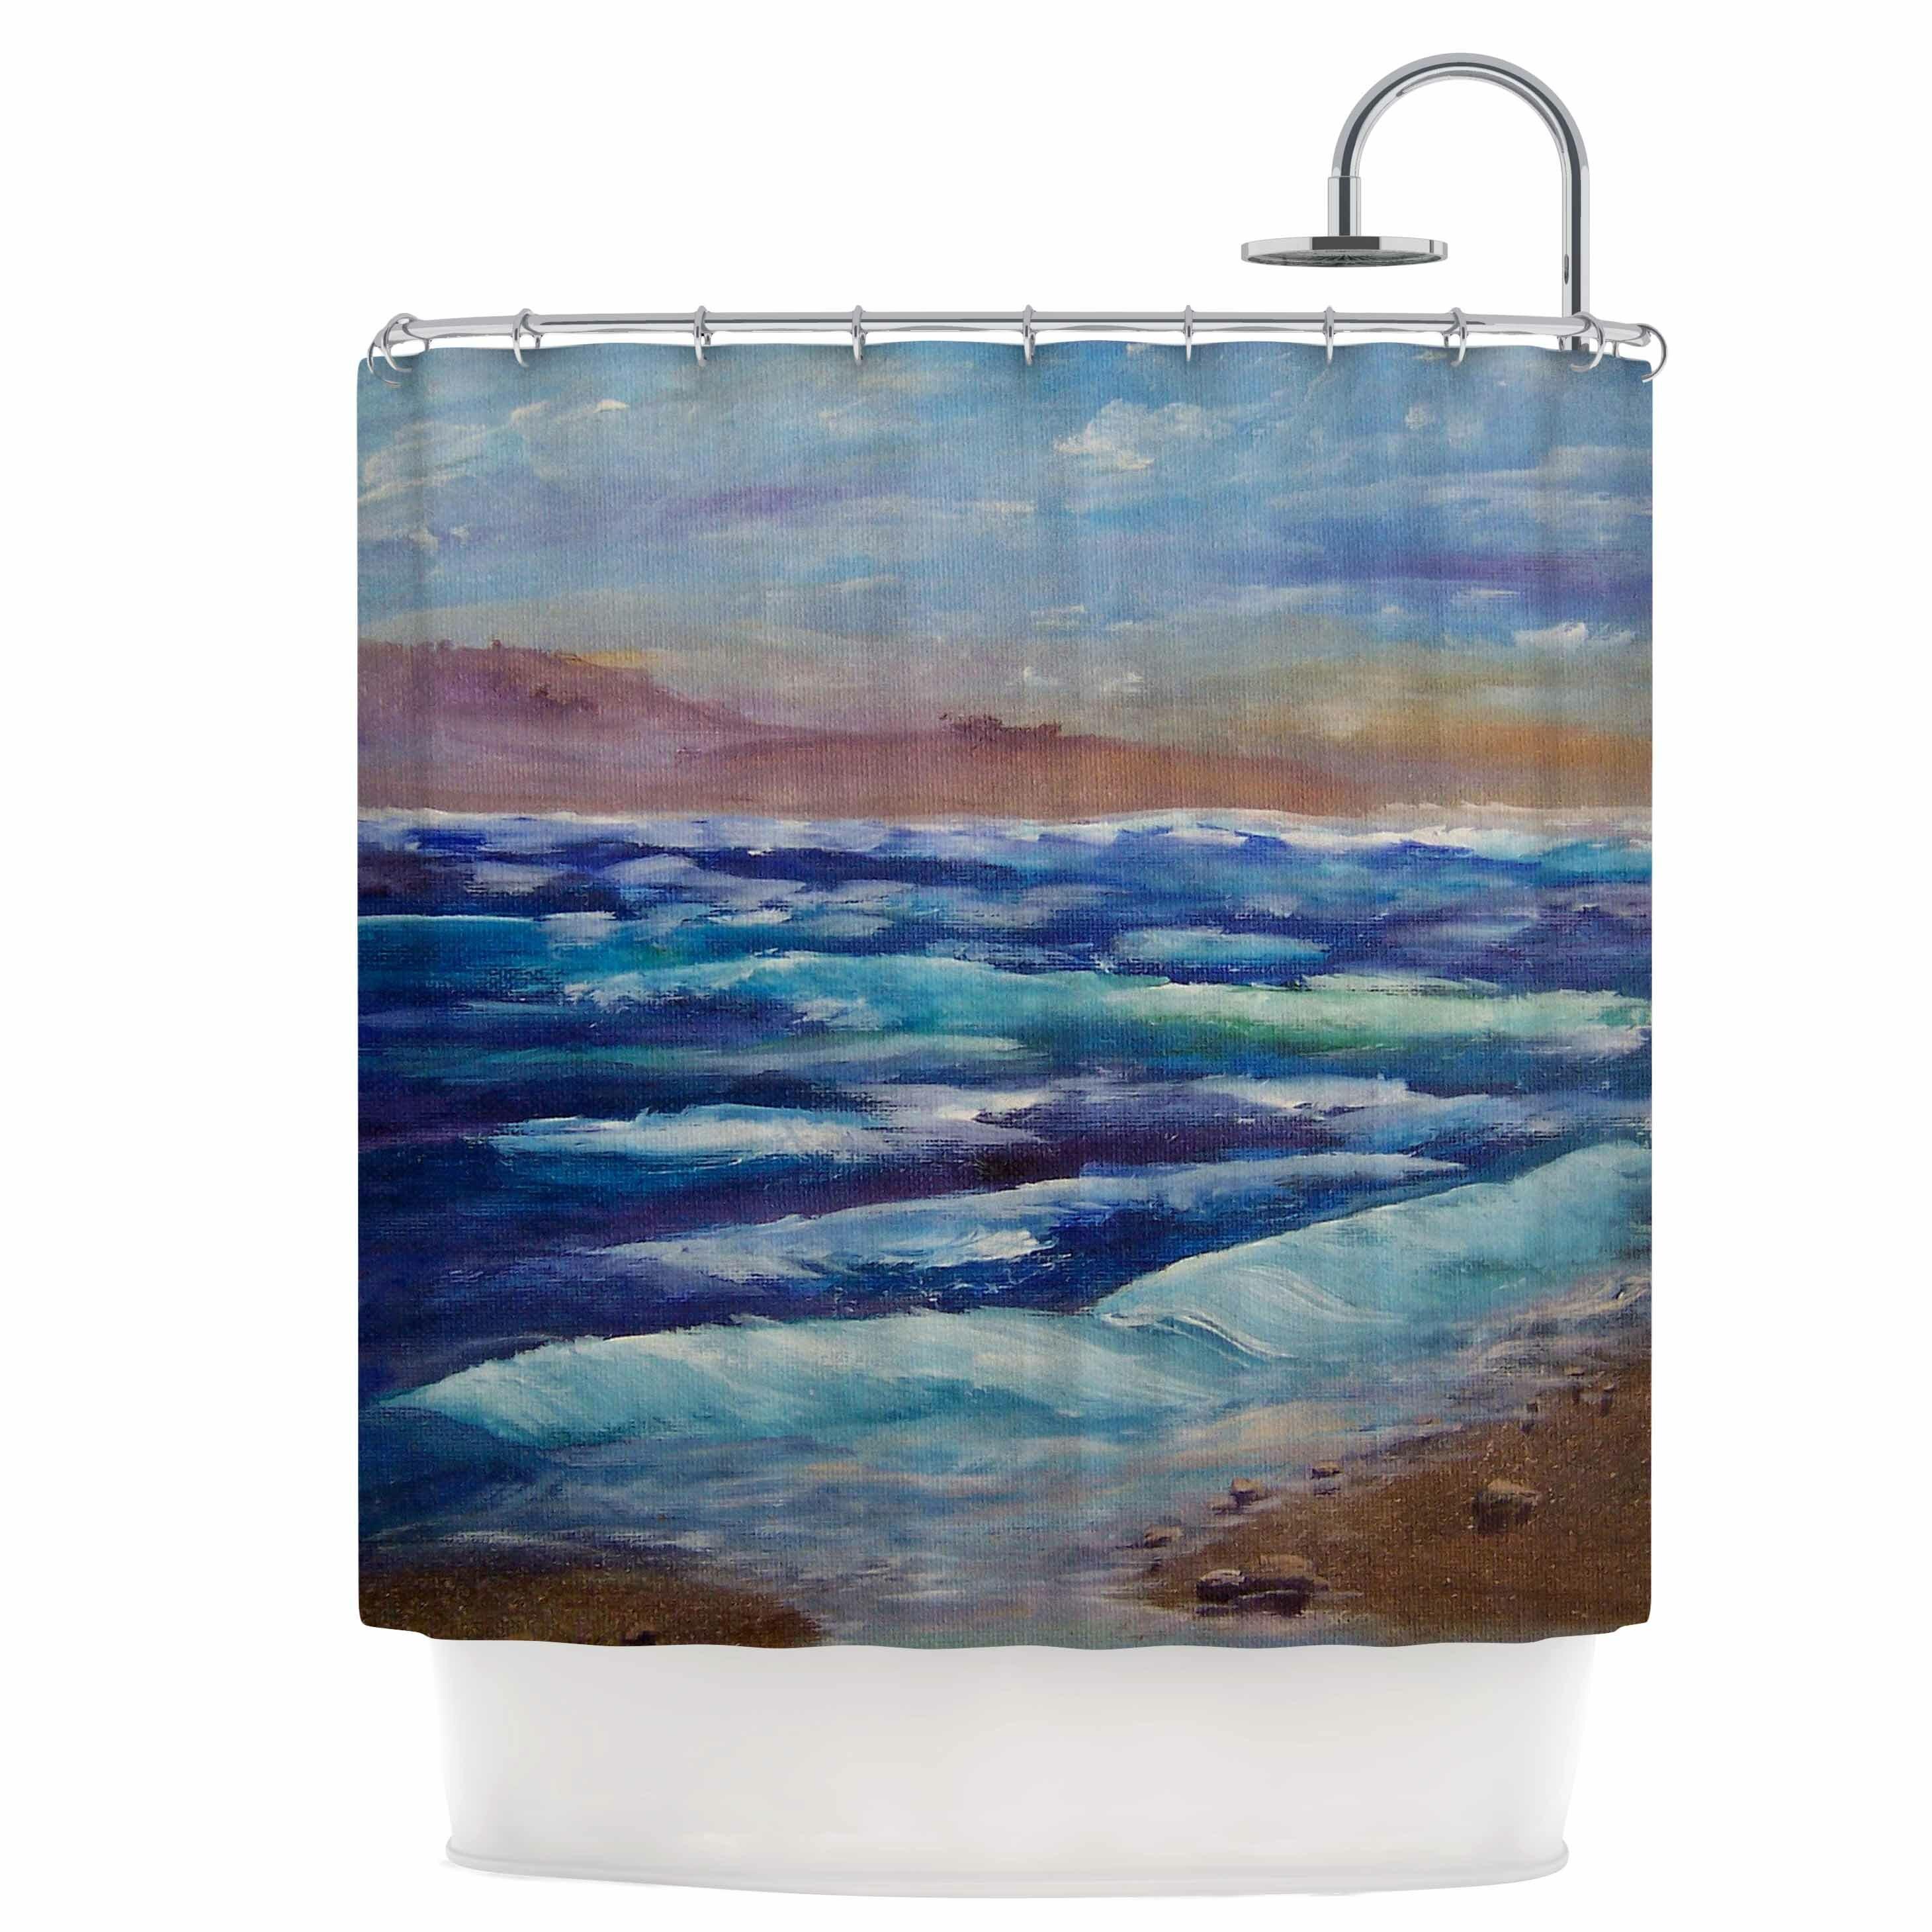 69 by 70 Kess InHouse Nick Nareshni Solana Beach Rolling Waves Blue Coastal Shower Curtain